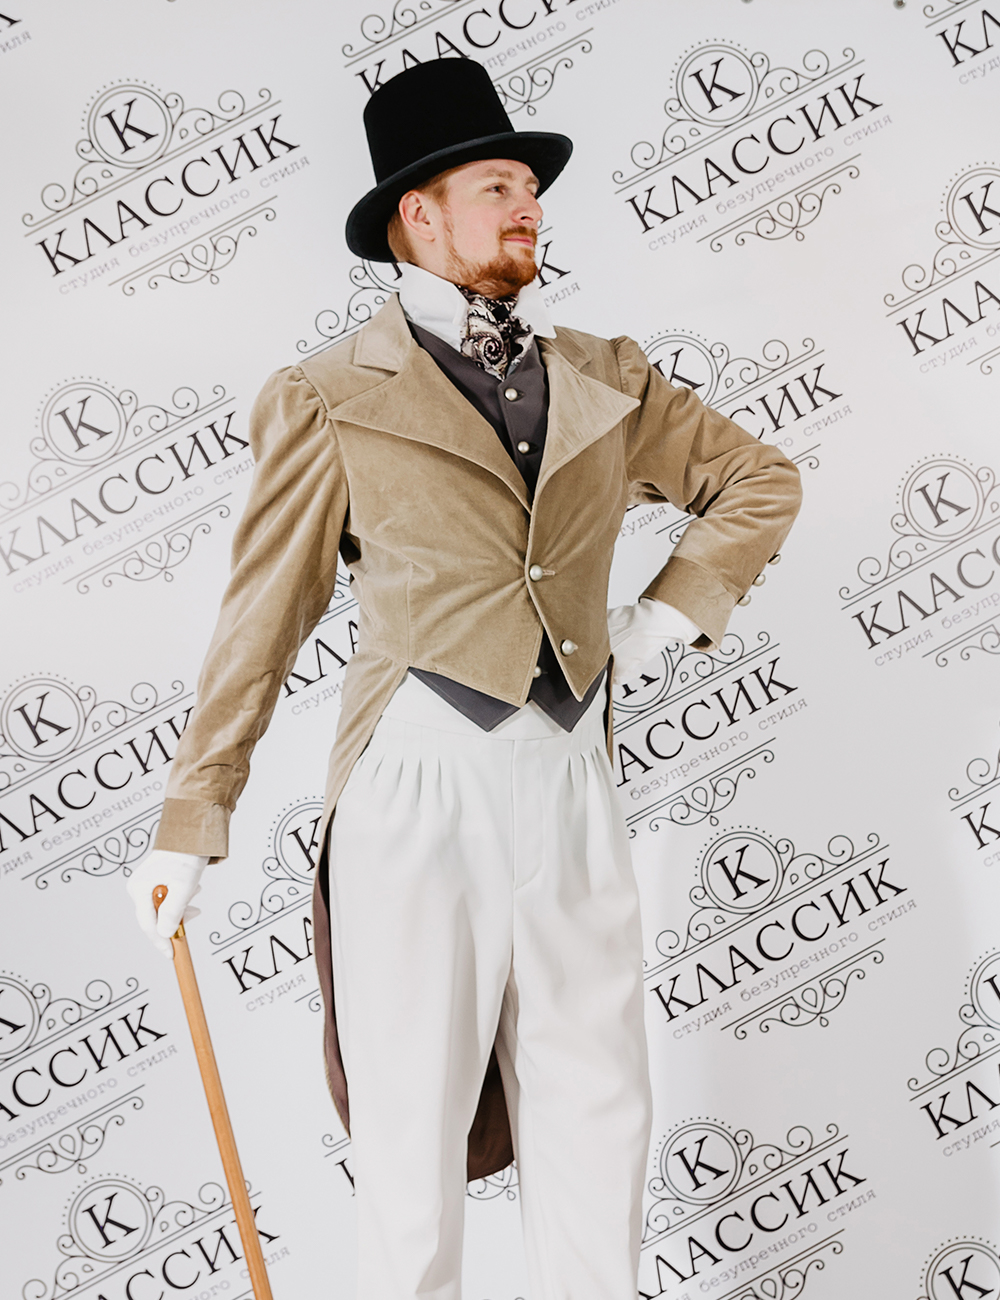 Мужской костюм Франт